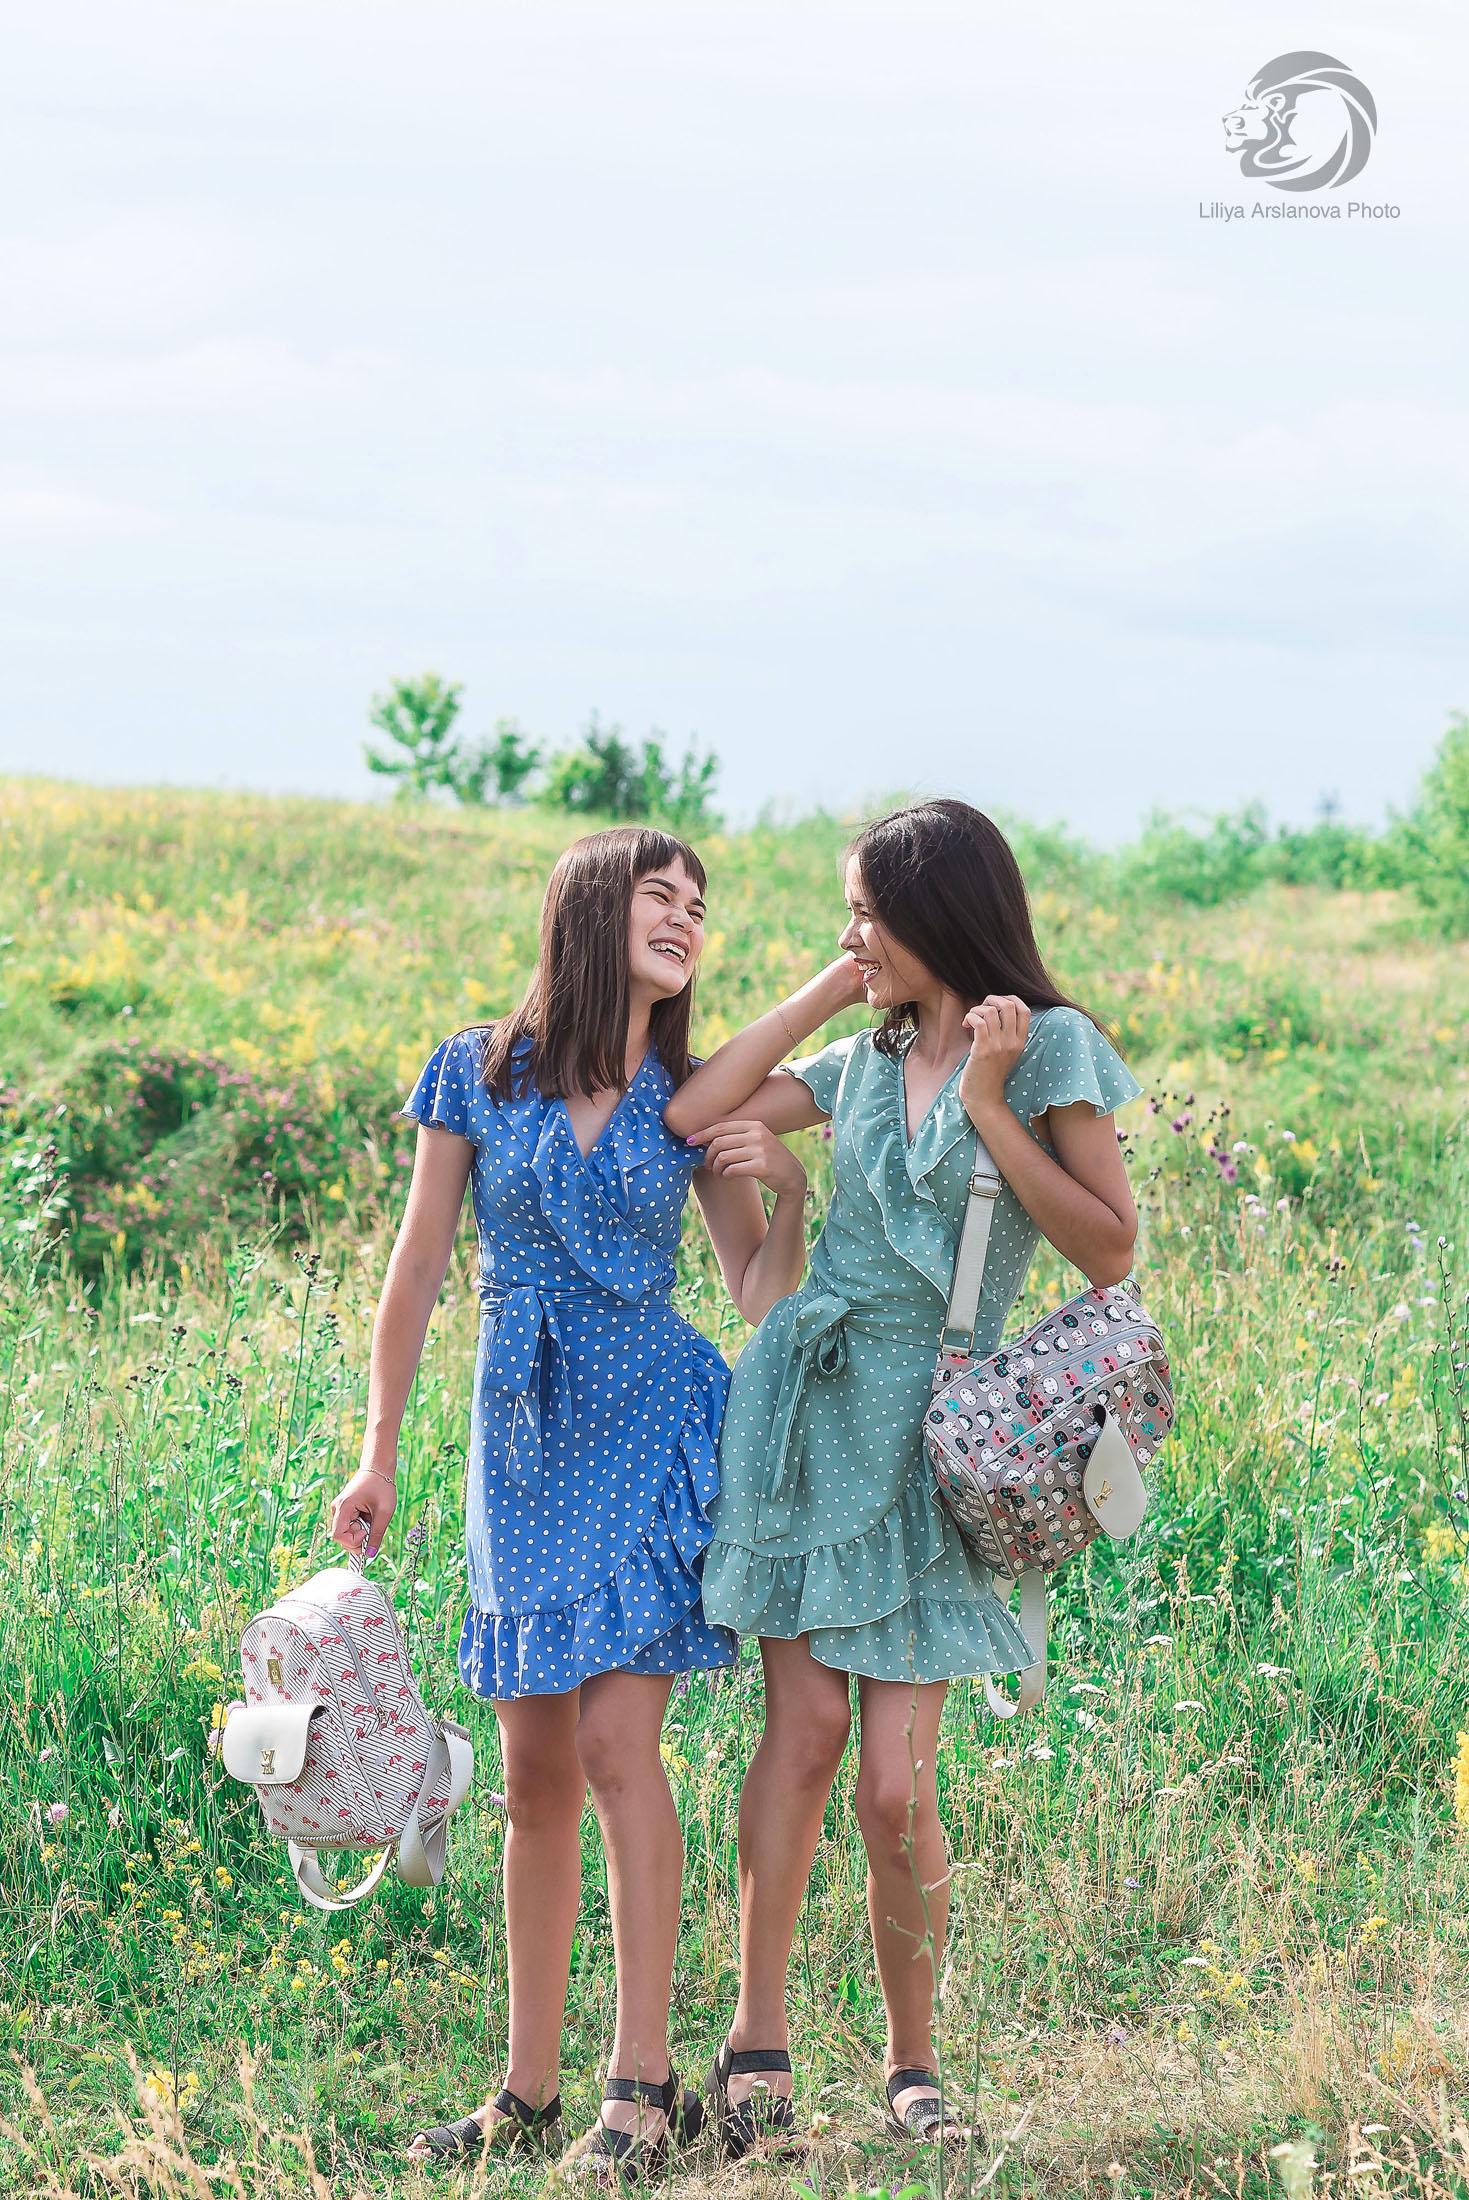 фотосессия сестер +на природе, фотосессия двух сестер, фотограф Стерлитамак Лилия Арсланова, sisters, sisters photo, фотограф сестер, девушки стерлитамак Лилия Арсланова веселье